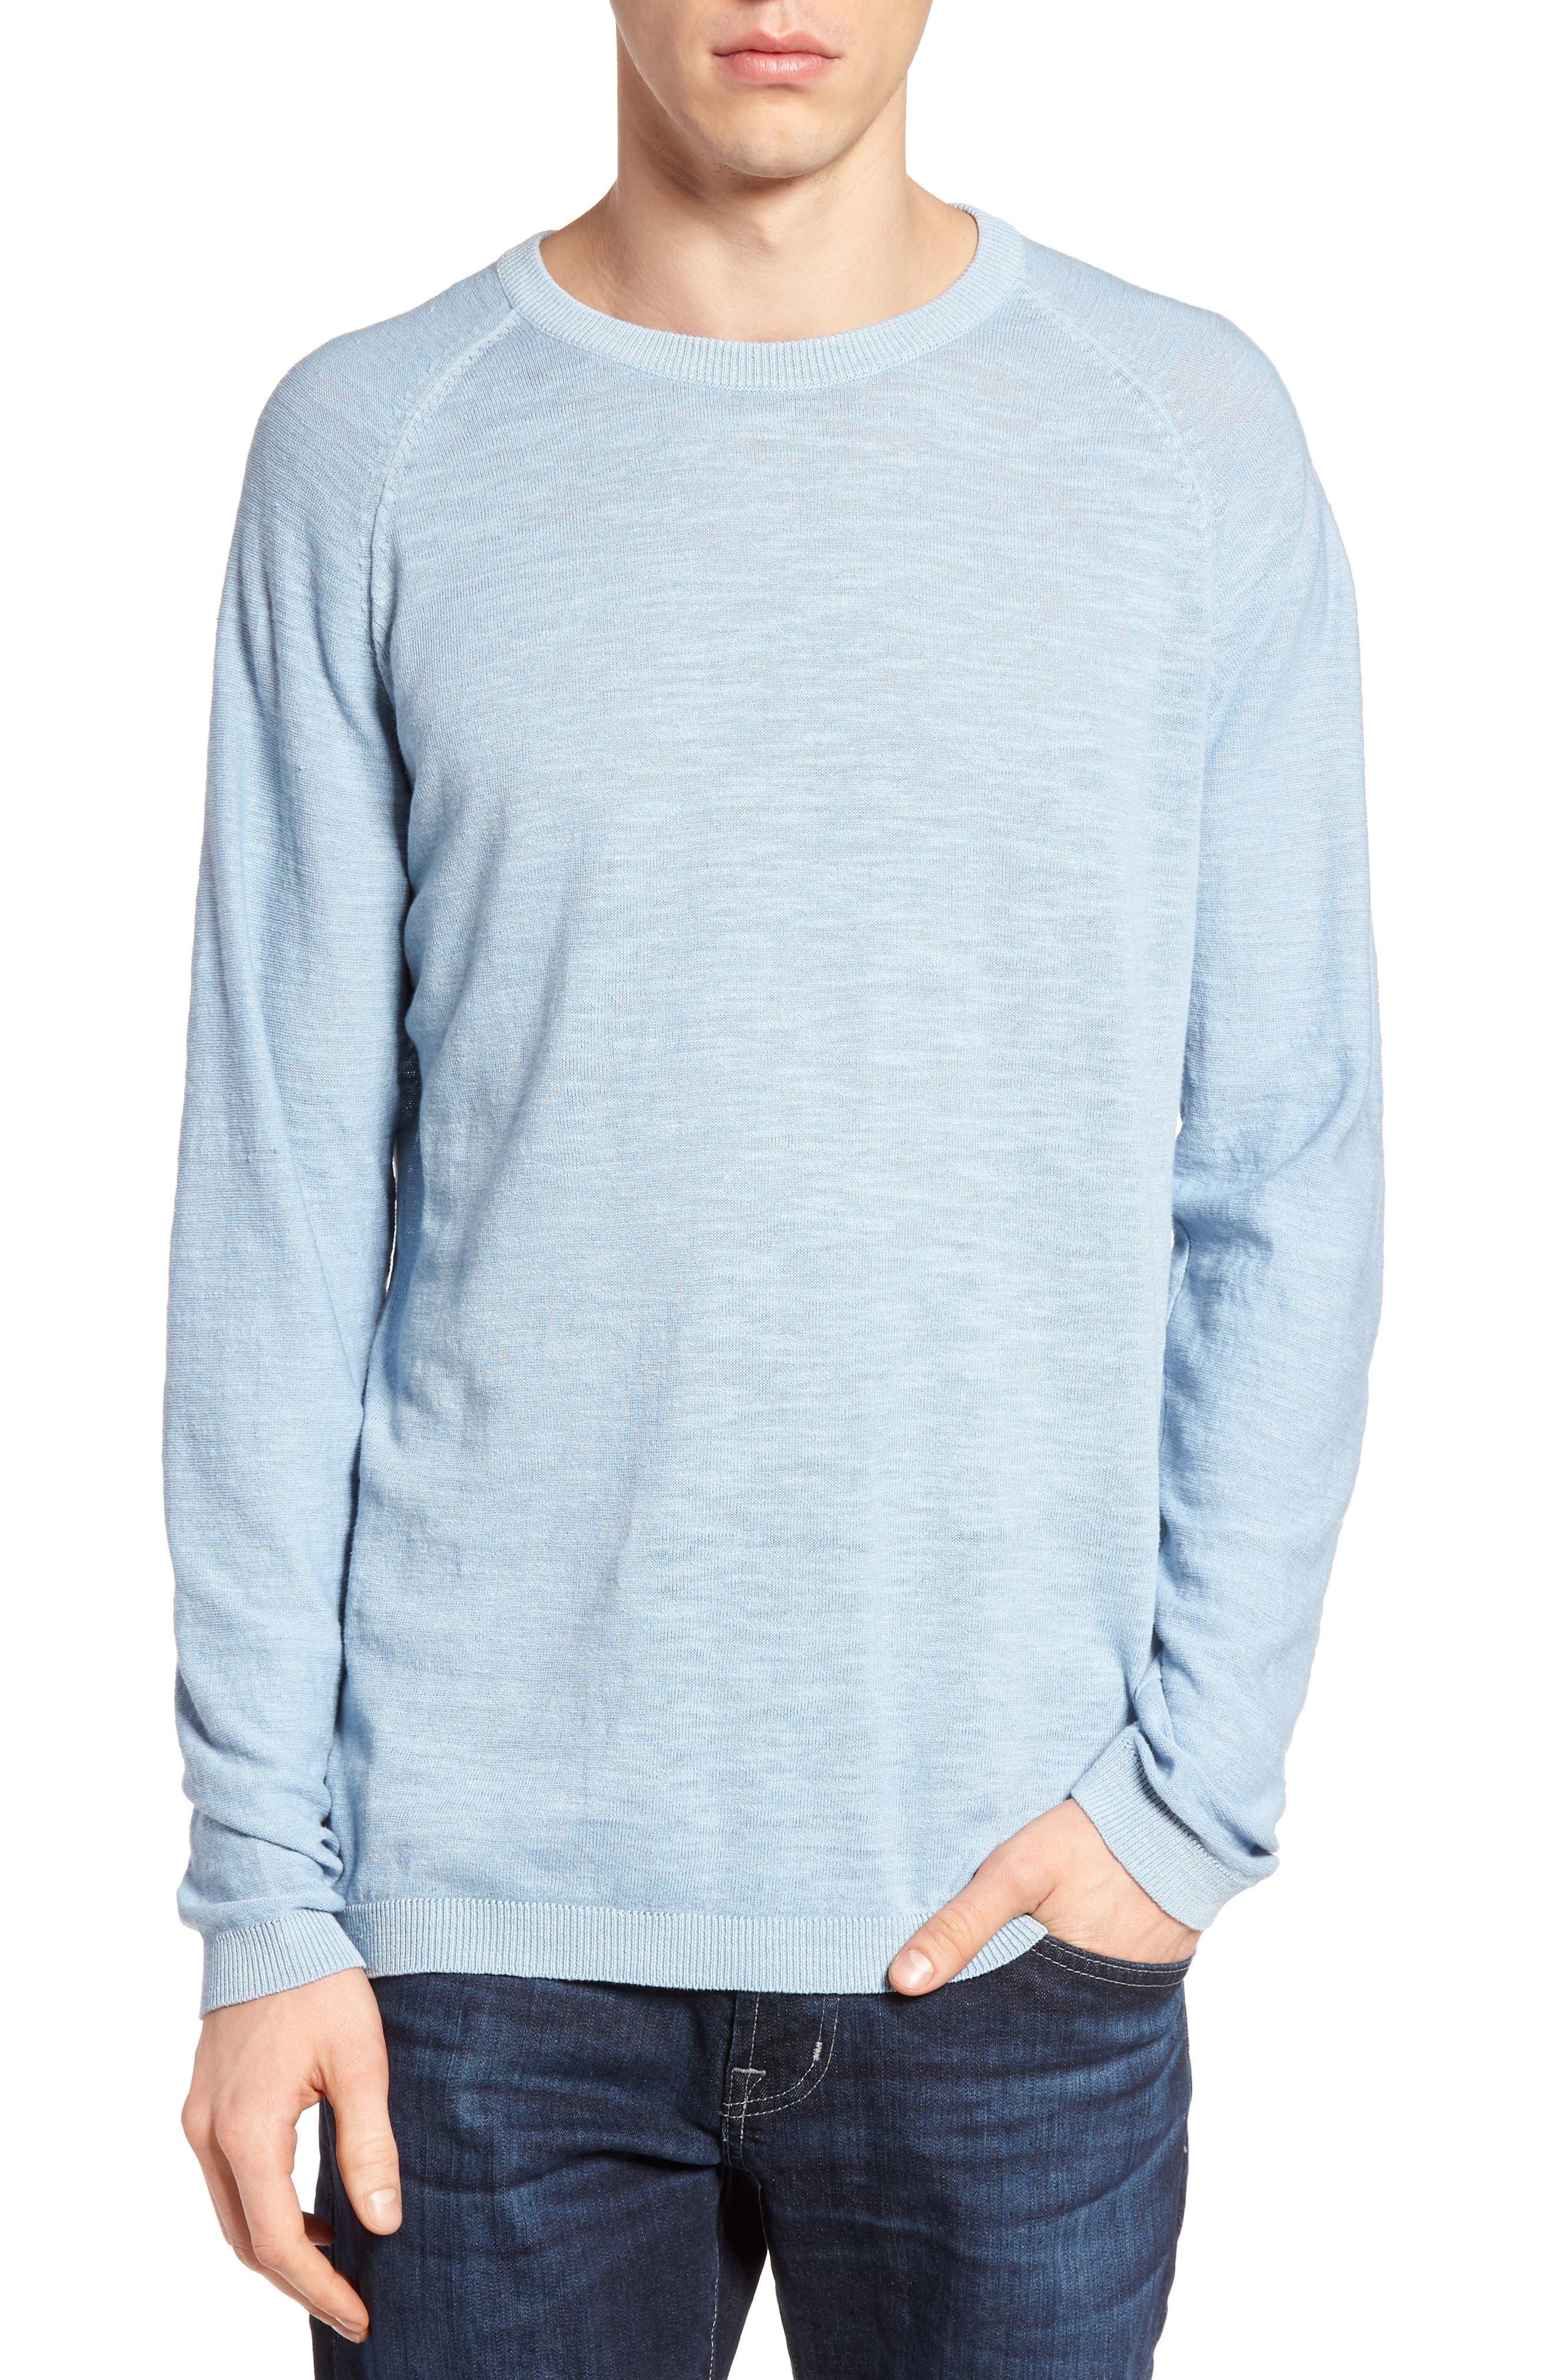 Arambol Cotton & Linen Sweater,                         Main,                         color, Blue Lagoon